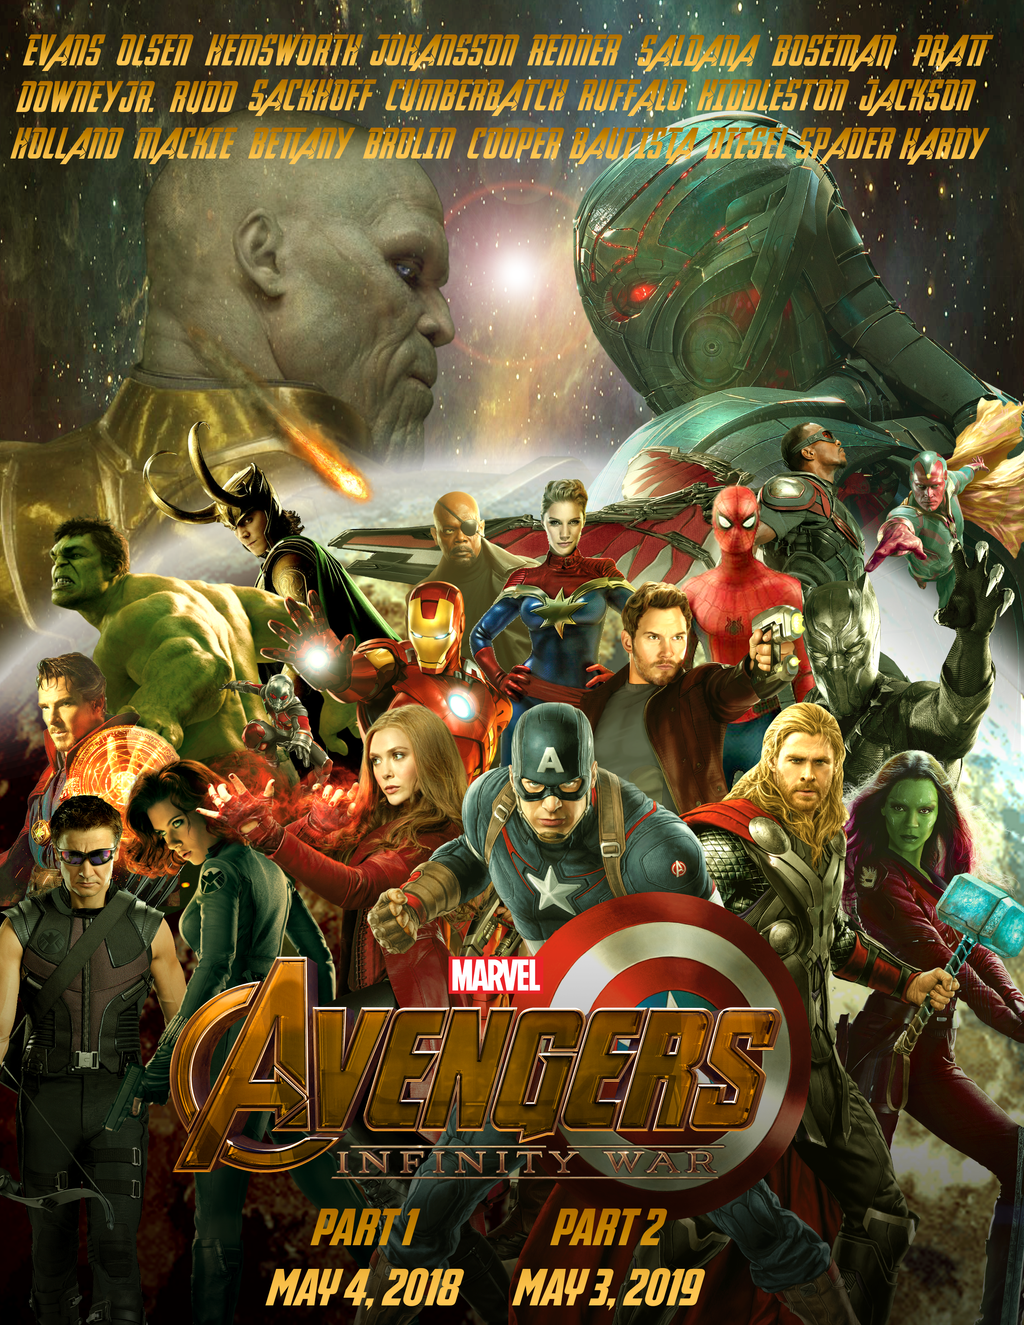 avengers: infinity war poster by nunkinz1000 on deviantart